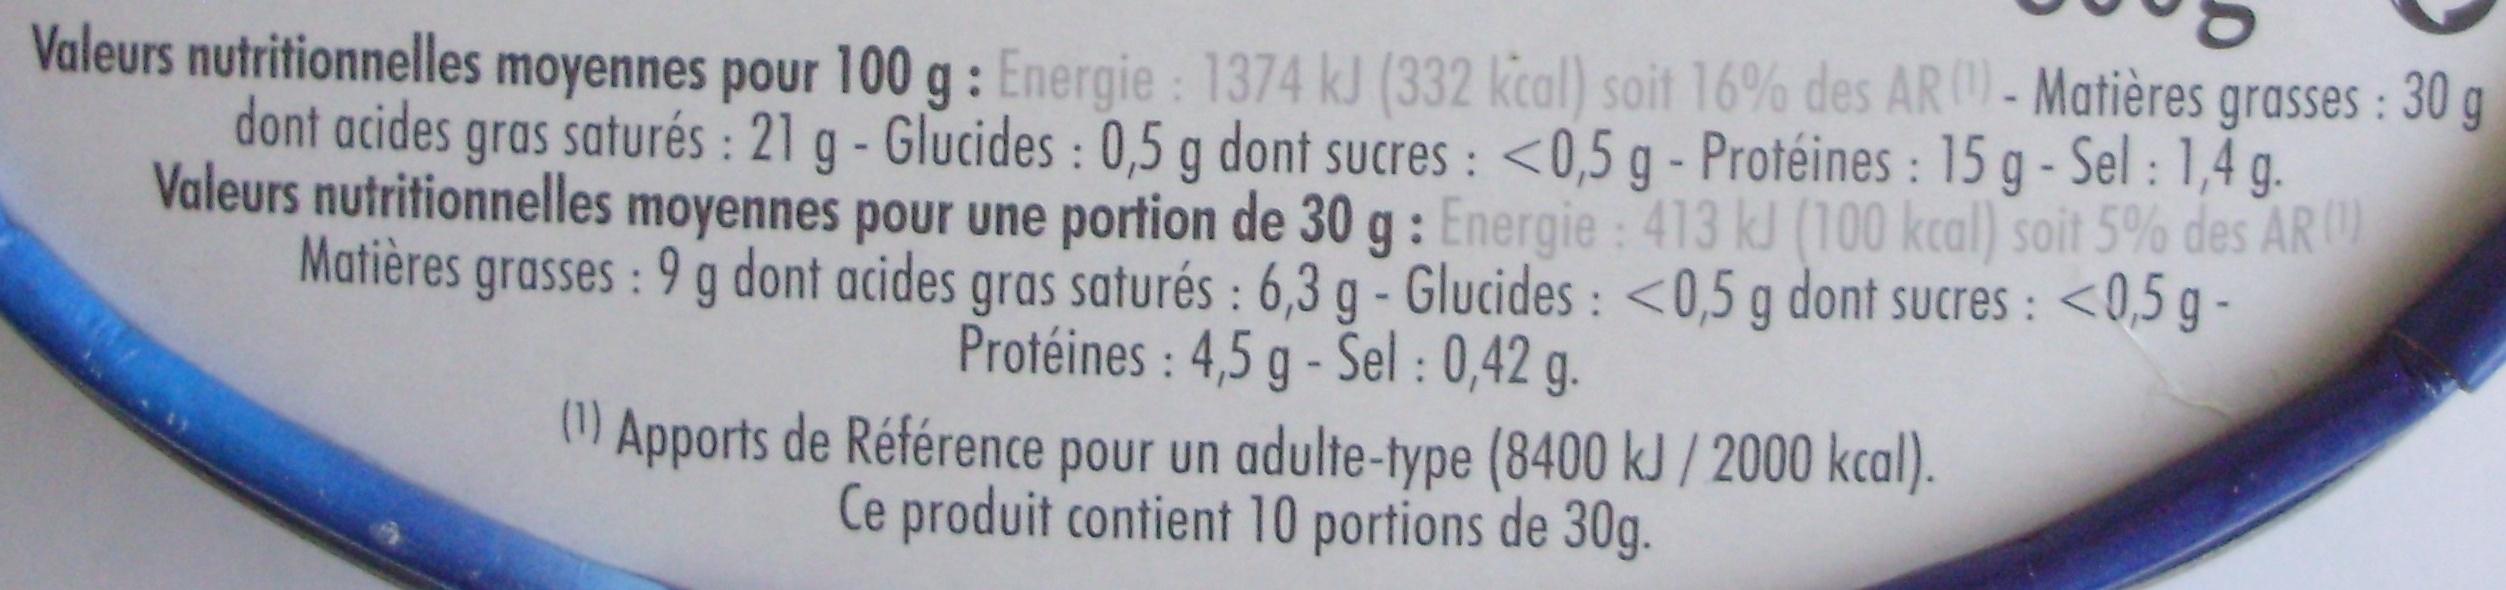 Fleur d'ange - Nutrition facts - fr